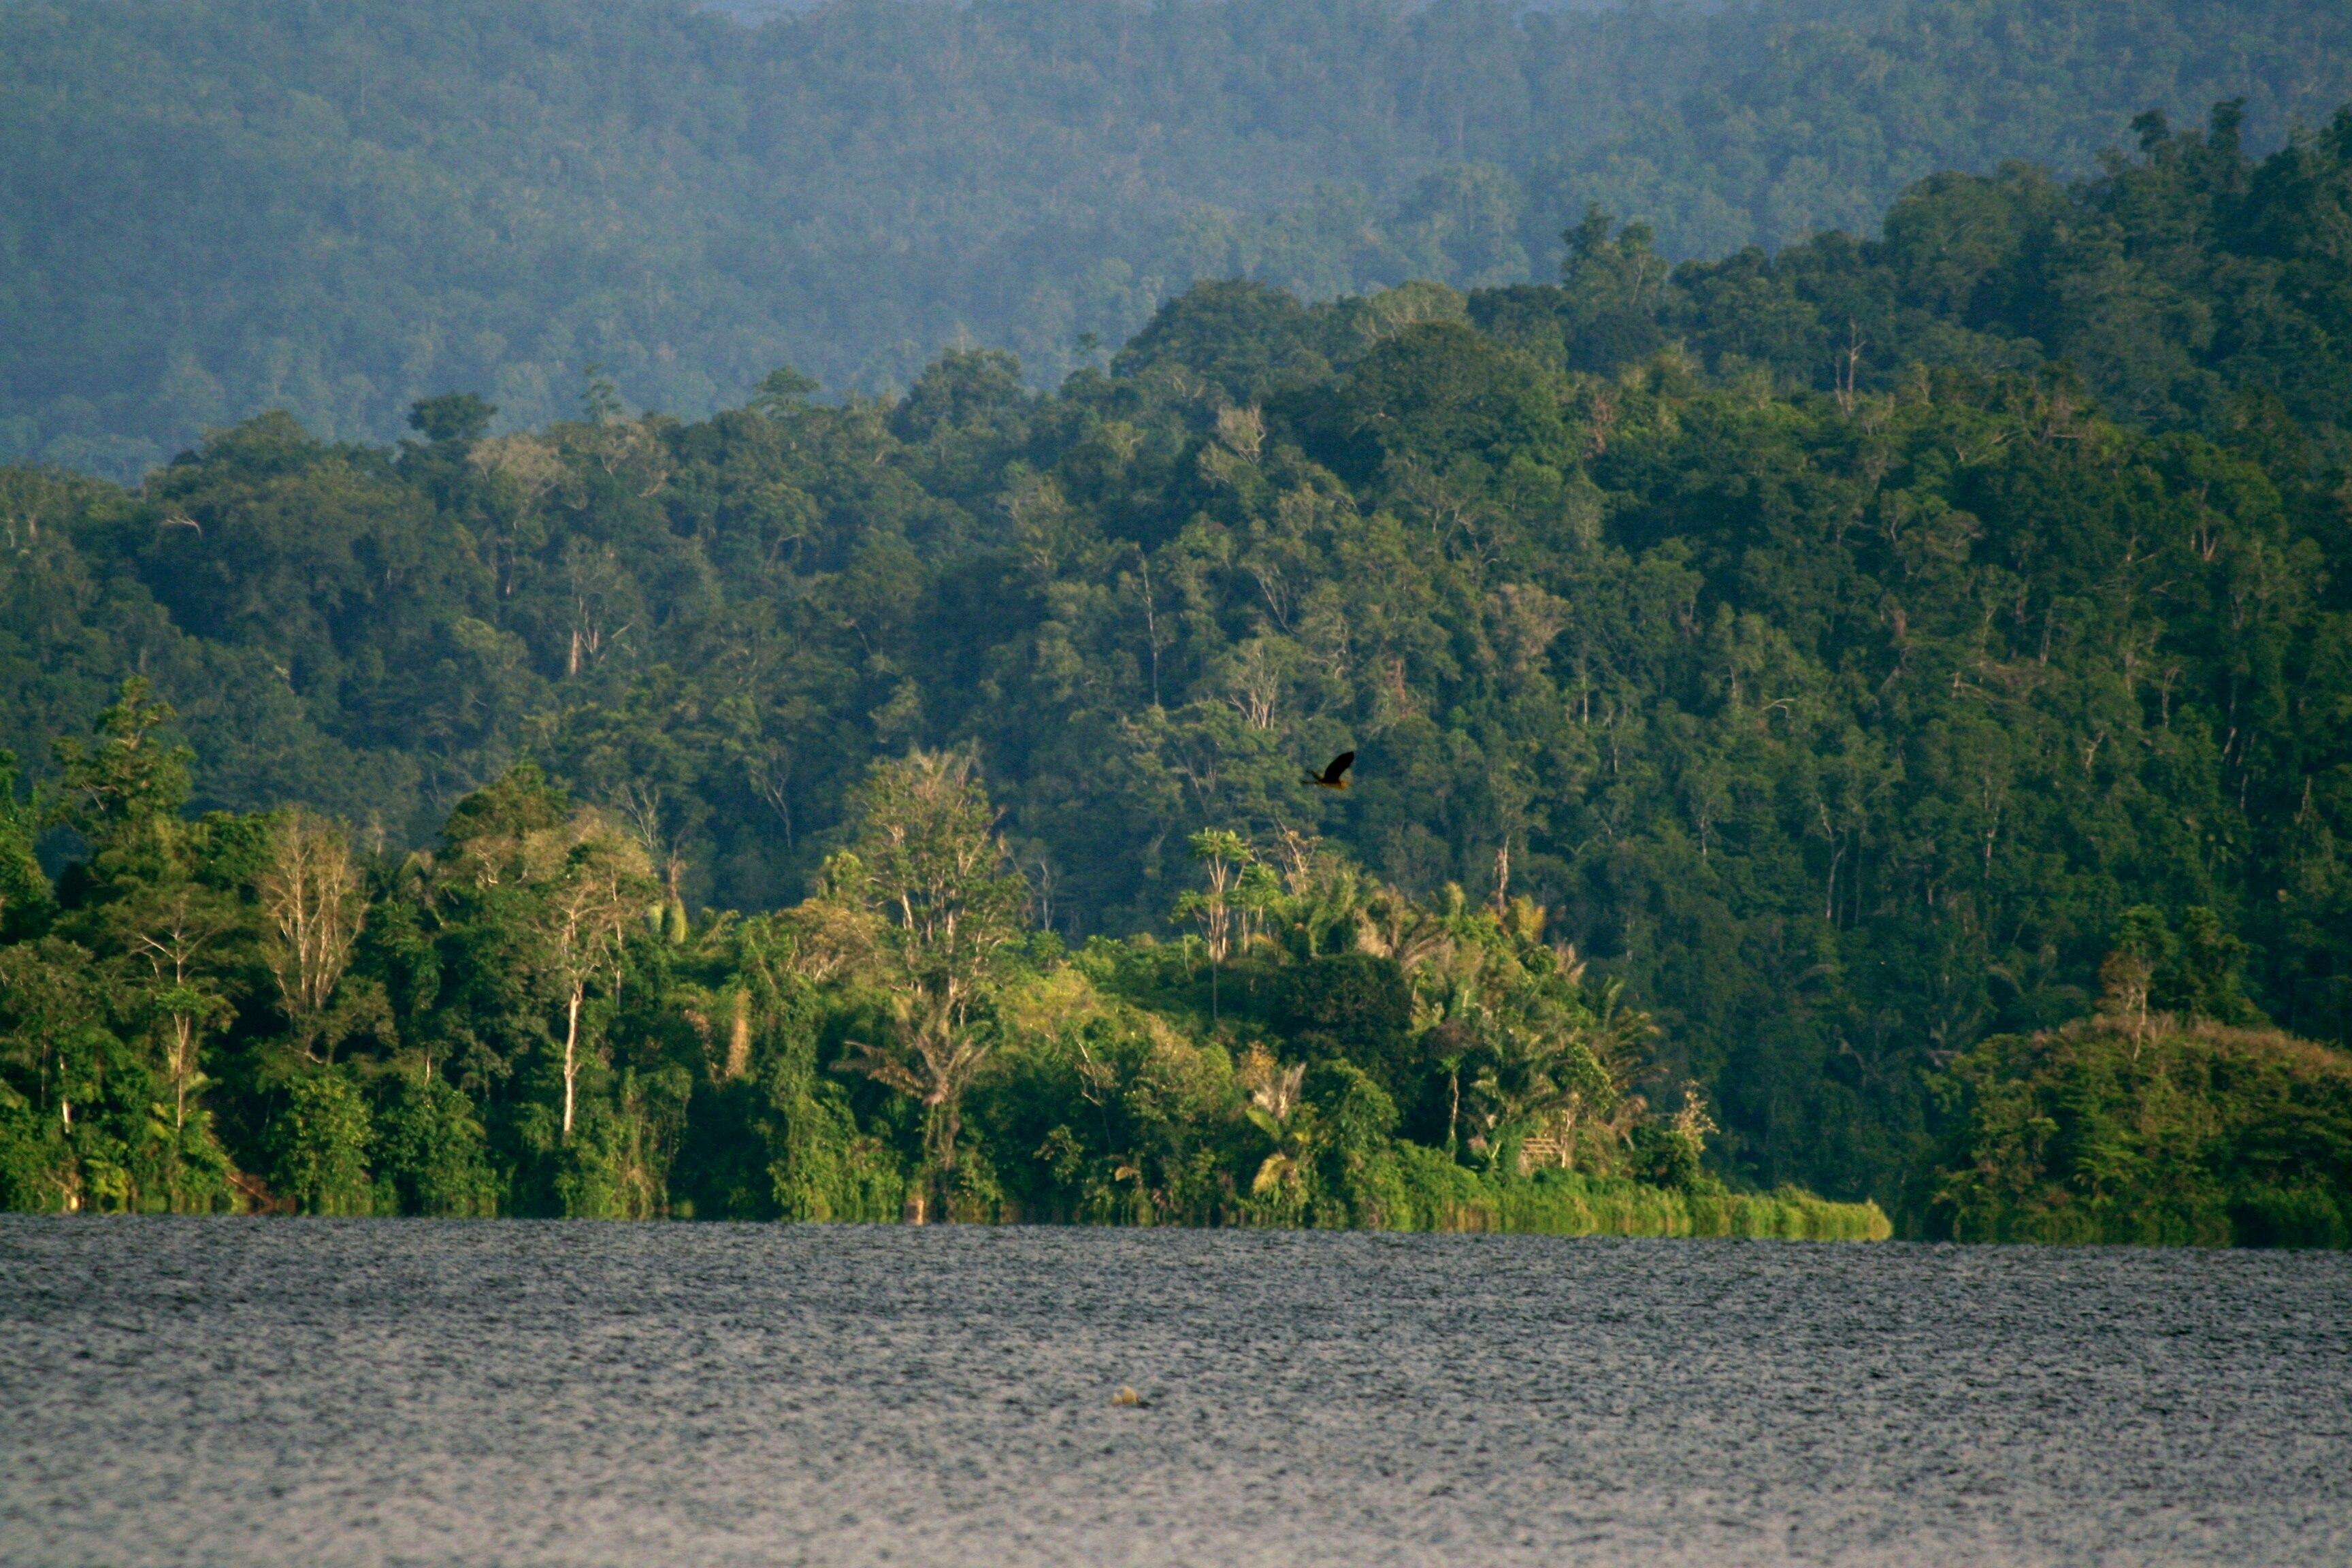 Parque Nacional de Lindu, Indonesia